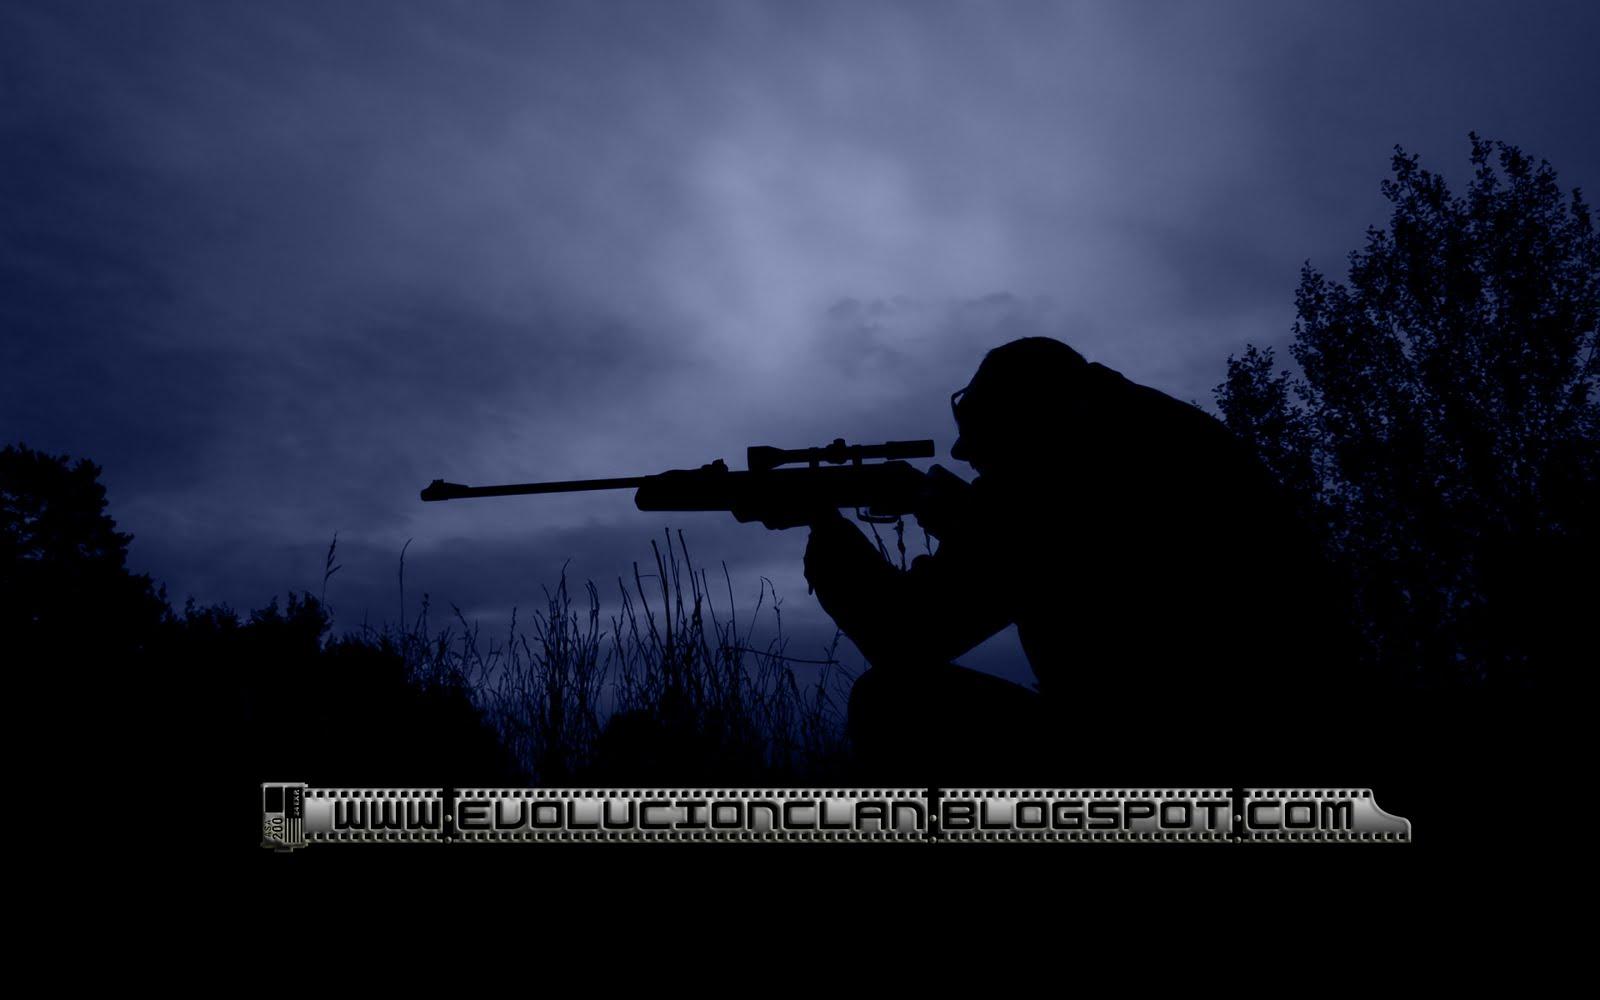 http://2.bp.blogspot.com/_7Ia1AXeECyU/S_hhOGOnWSI/AAAAAAAAAE0/rdrLkLJQ4qI/s1600/evol_Wallpaper_Night_sniper.jpg